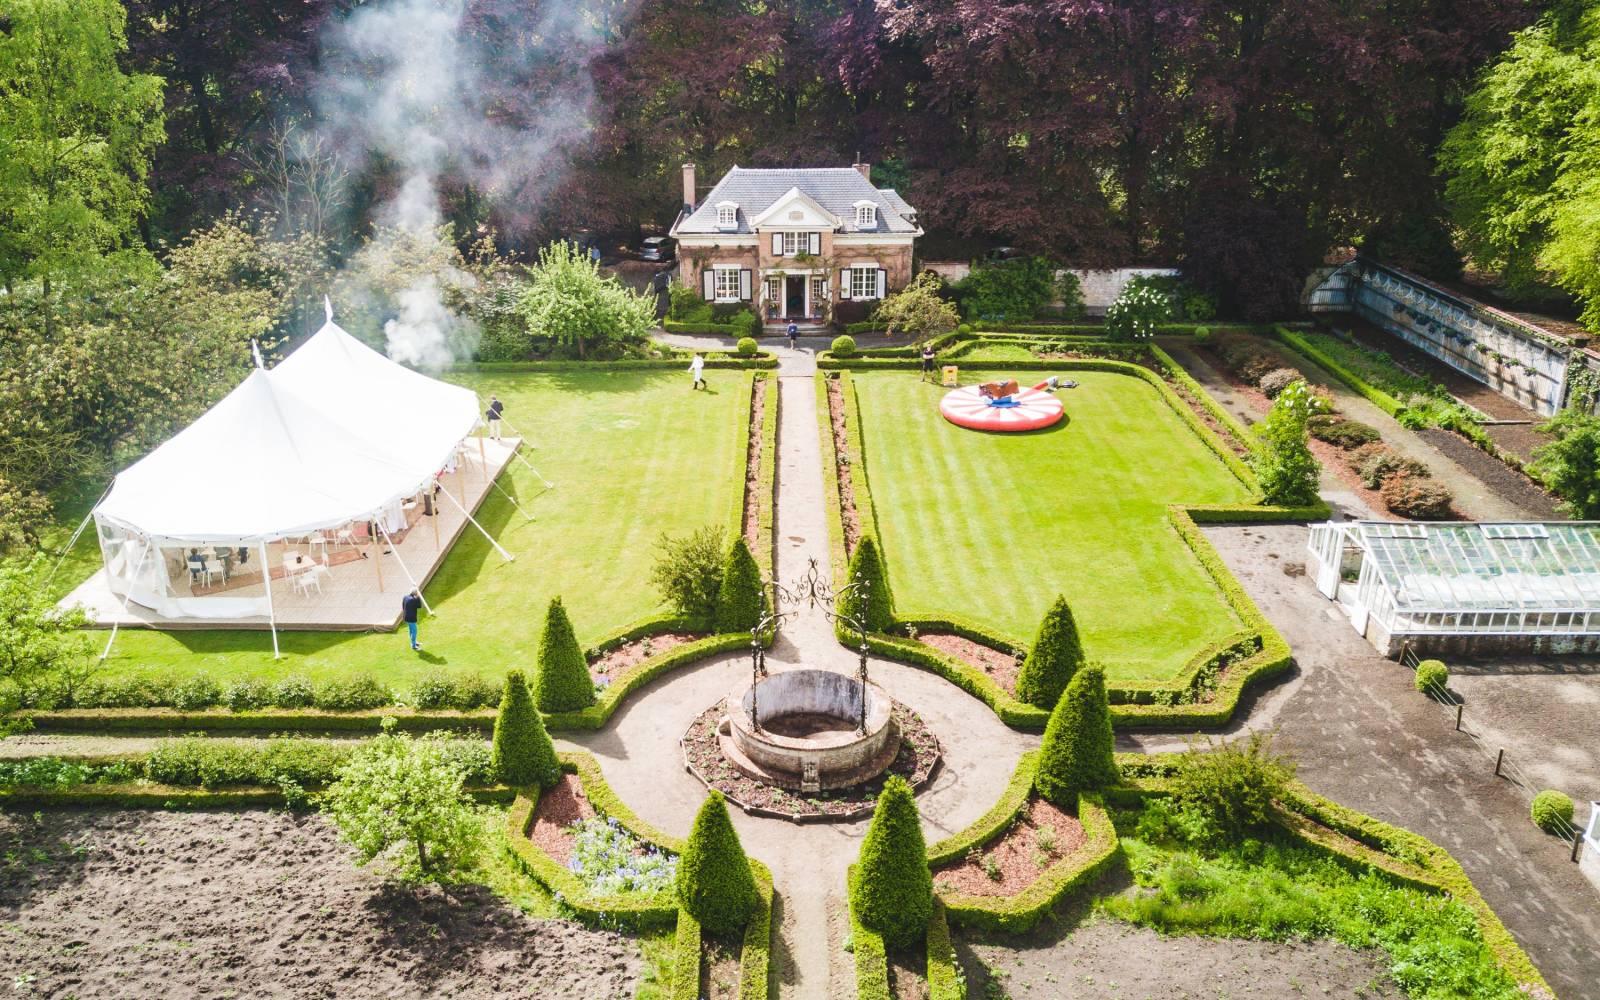 Wolvenbos - House of Weddings  - 9